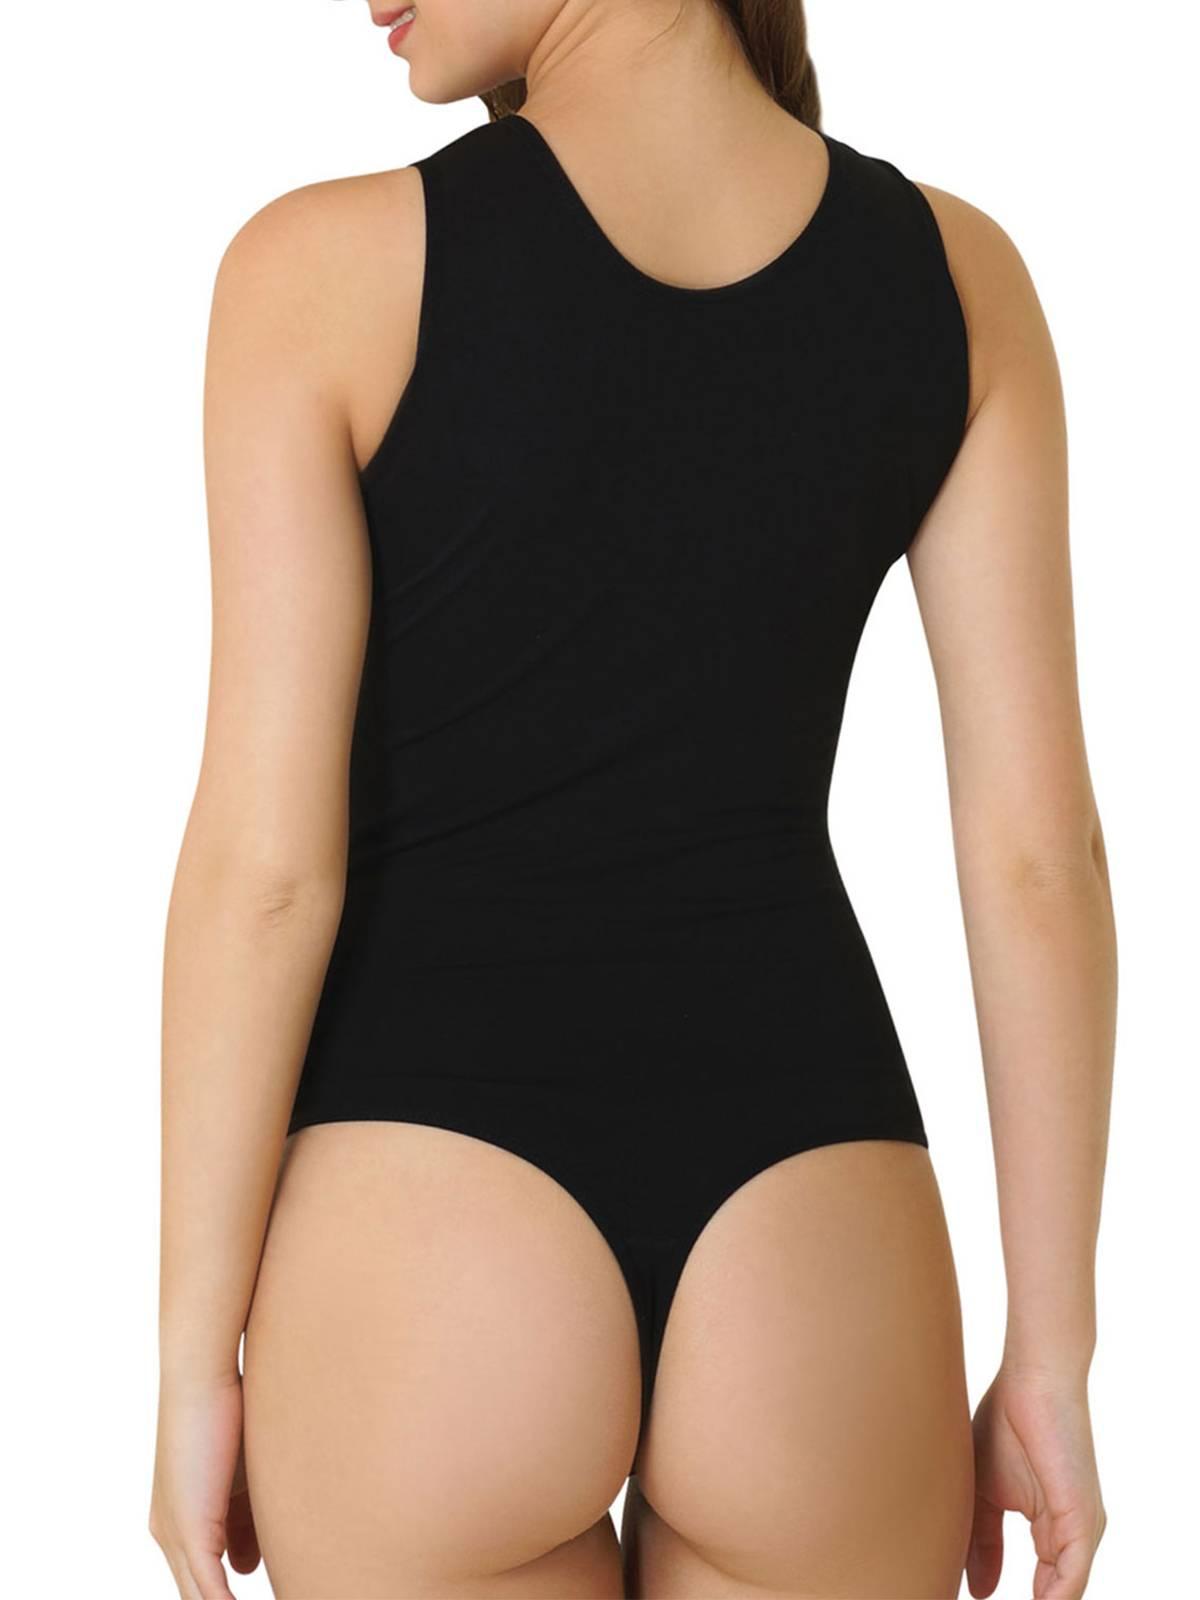 Kefali Stringbody Damenbody Unterwäsche Business Unterhemd Bodysuit KC207S